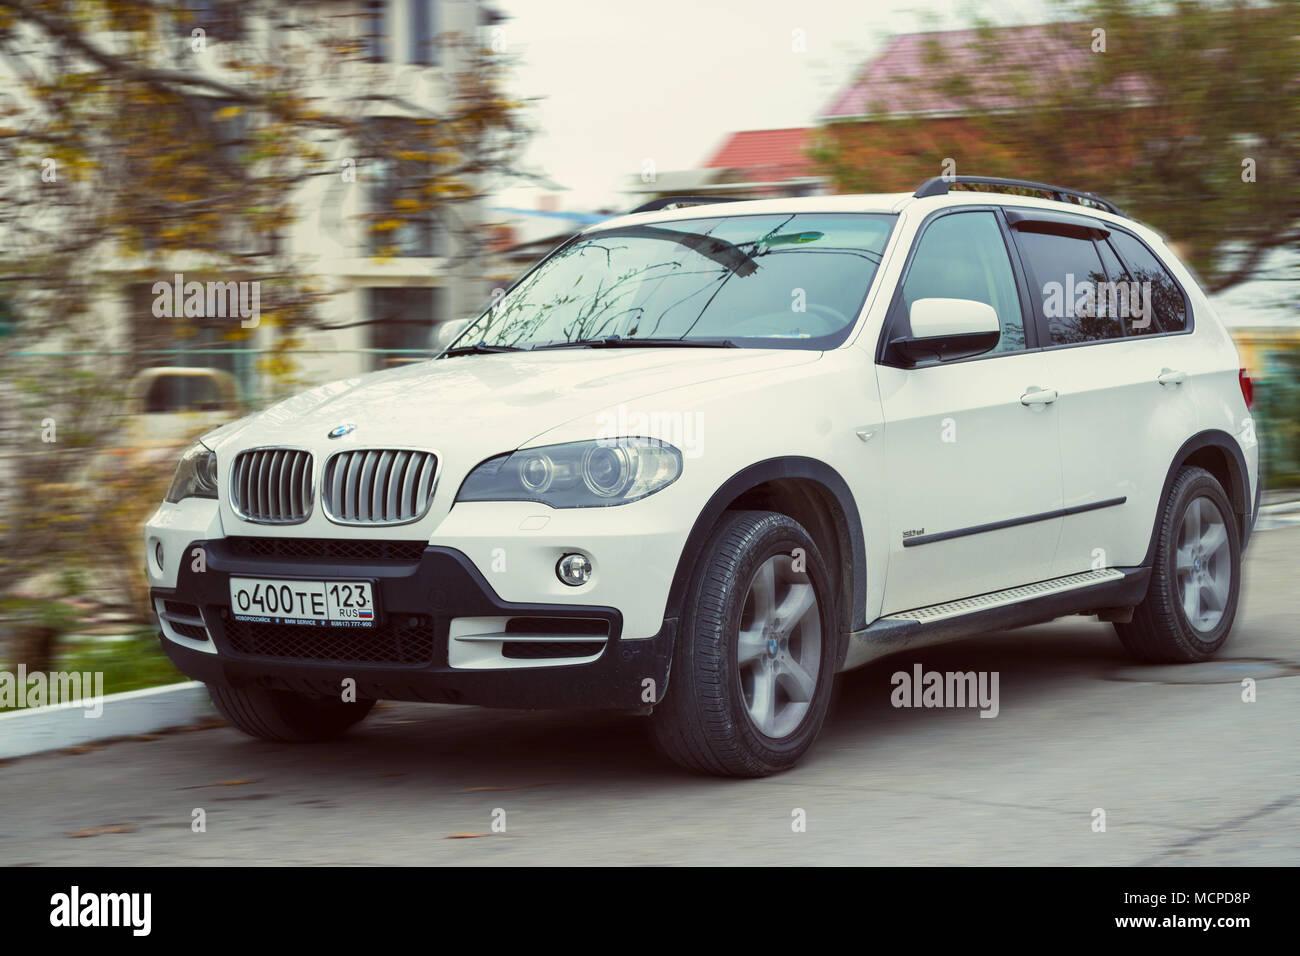 Sochi, Russia - November 10, 2017: New luxury BMW x5 on the street. - Stock Image